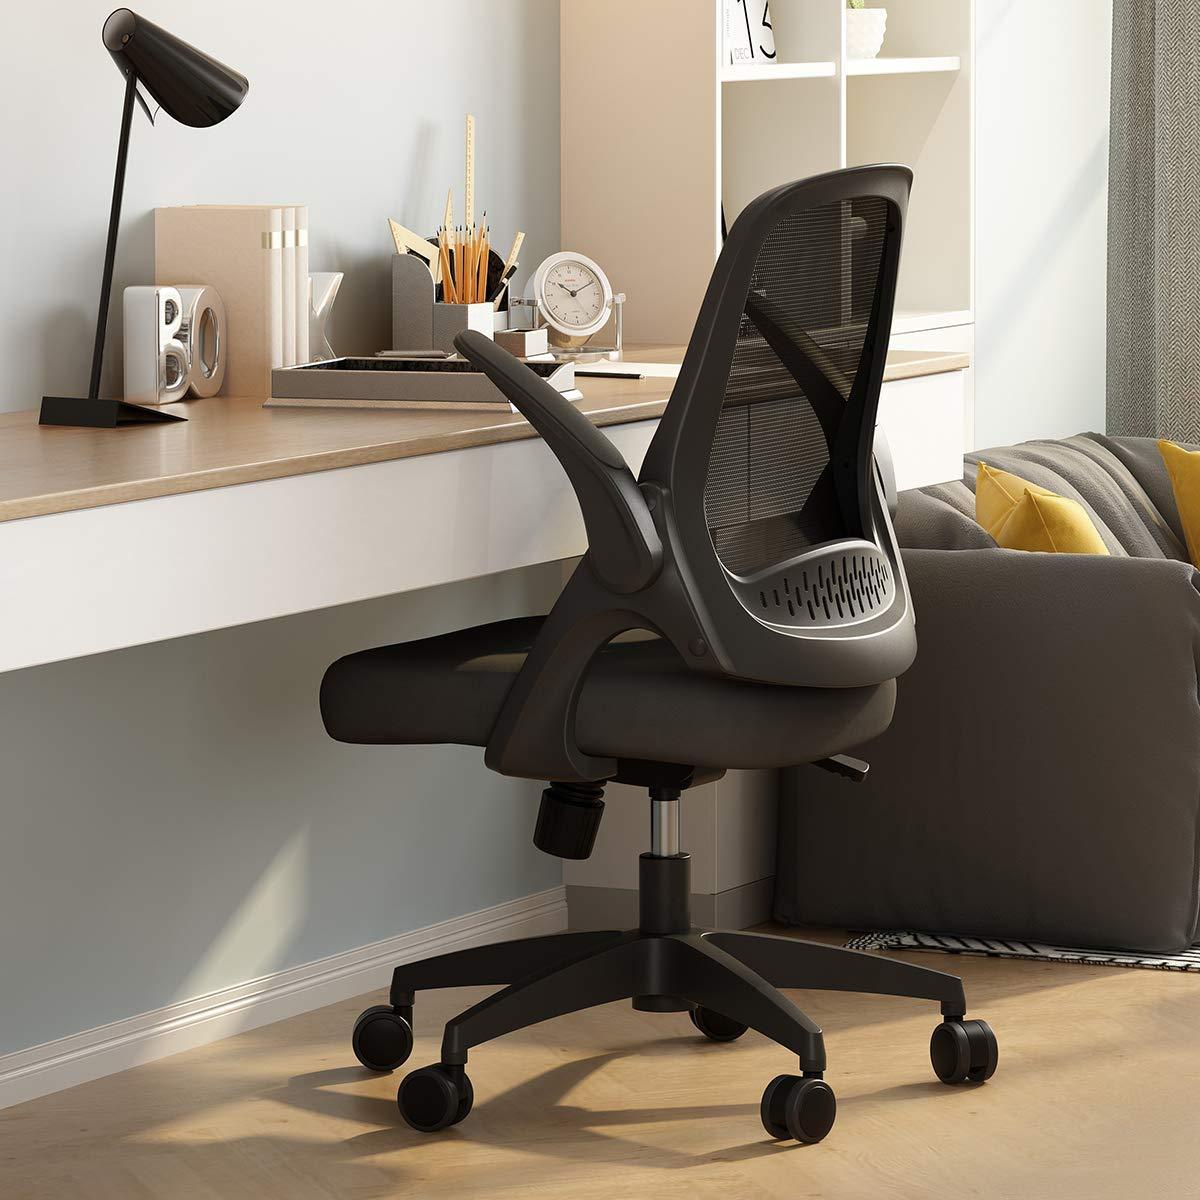 Hbada Swivel Office Chair